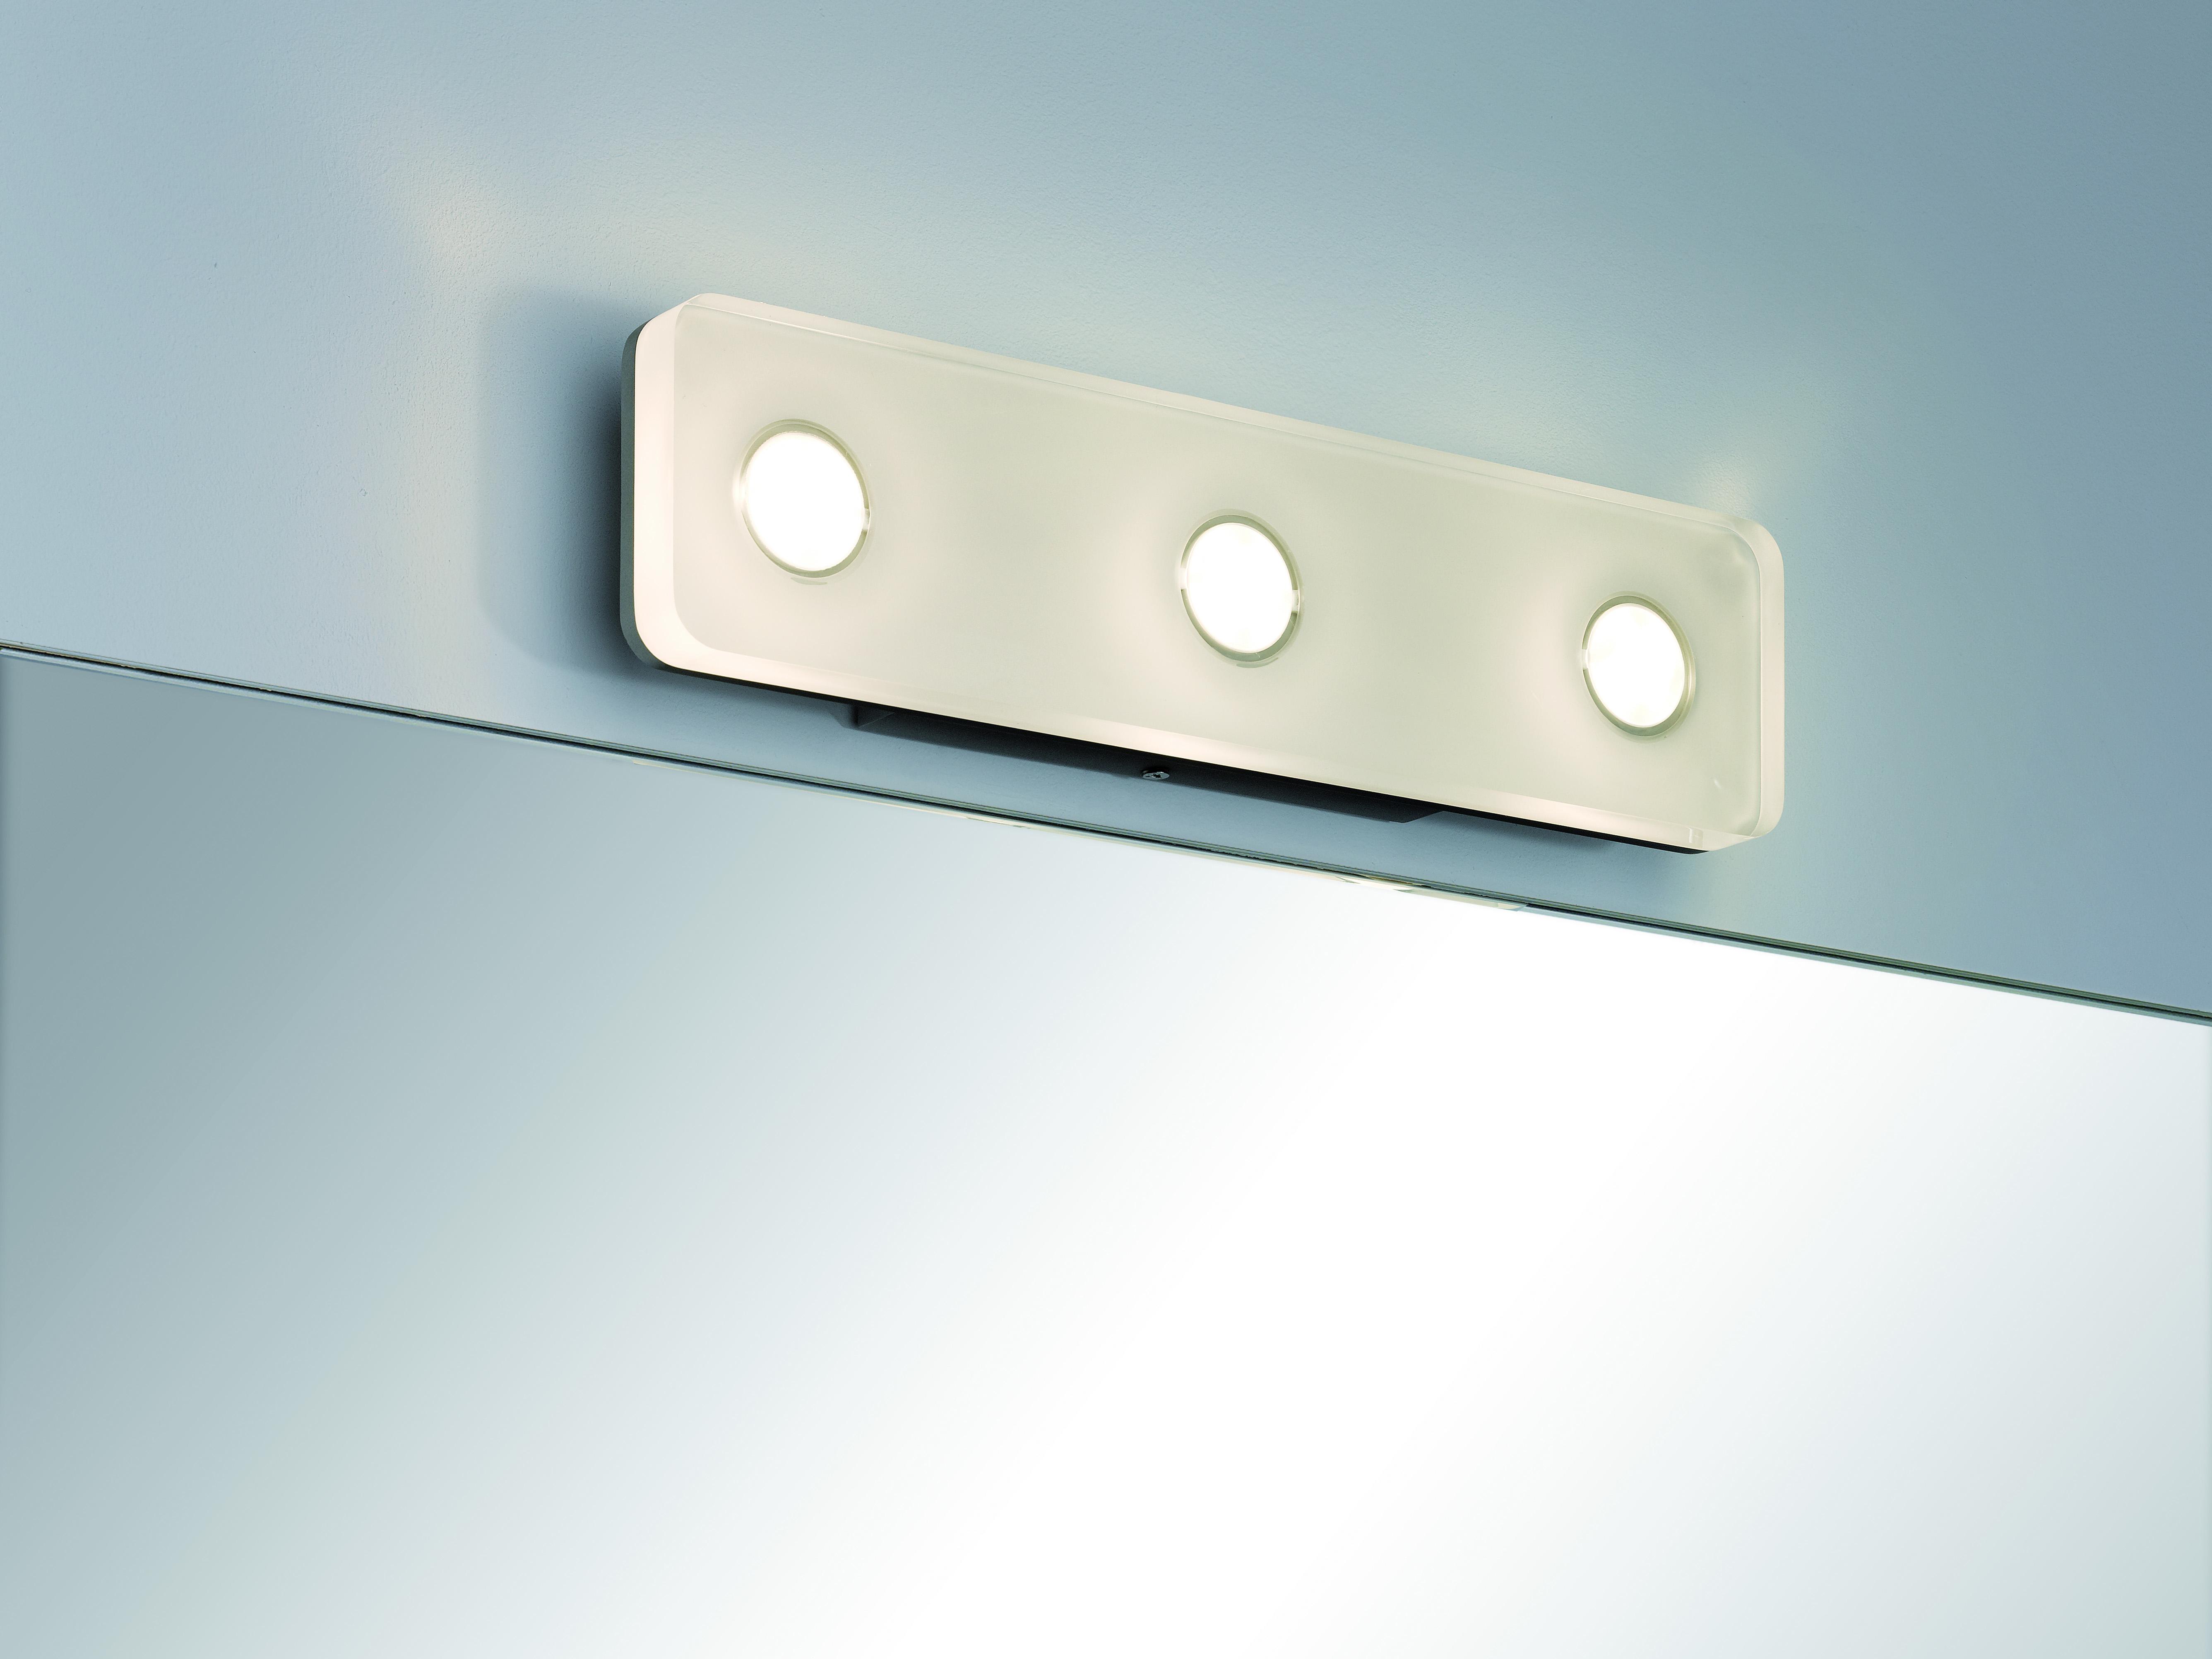 paulmann led wand spiegelleuchte theta 16w 230v 15va 3000k 400mm online kaufen im. Black Bedroom Furniture Sets. Home Design Ideas